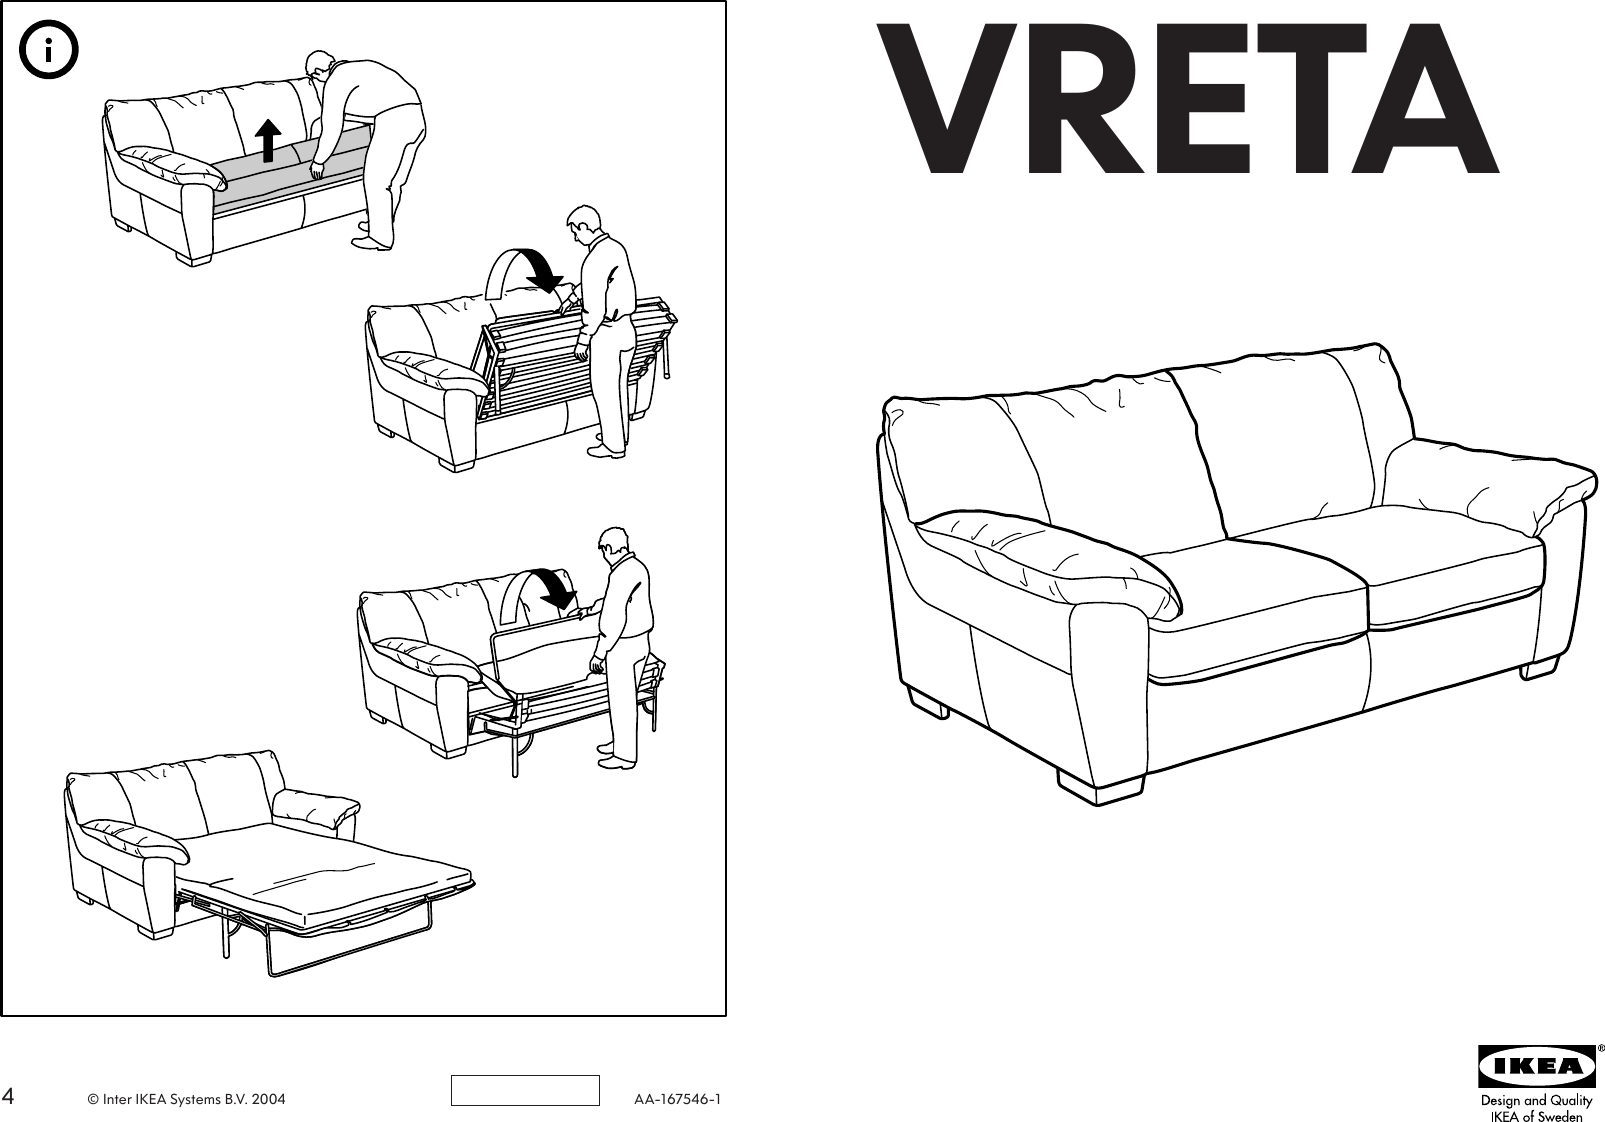 ikea friheten sofa bed embly instructions burgundy living room vreta red leather sanblasferry thesofa